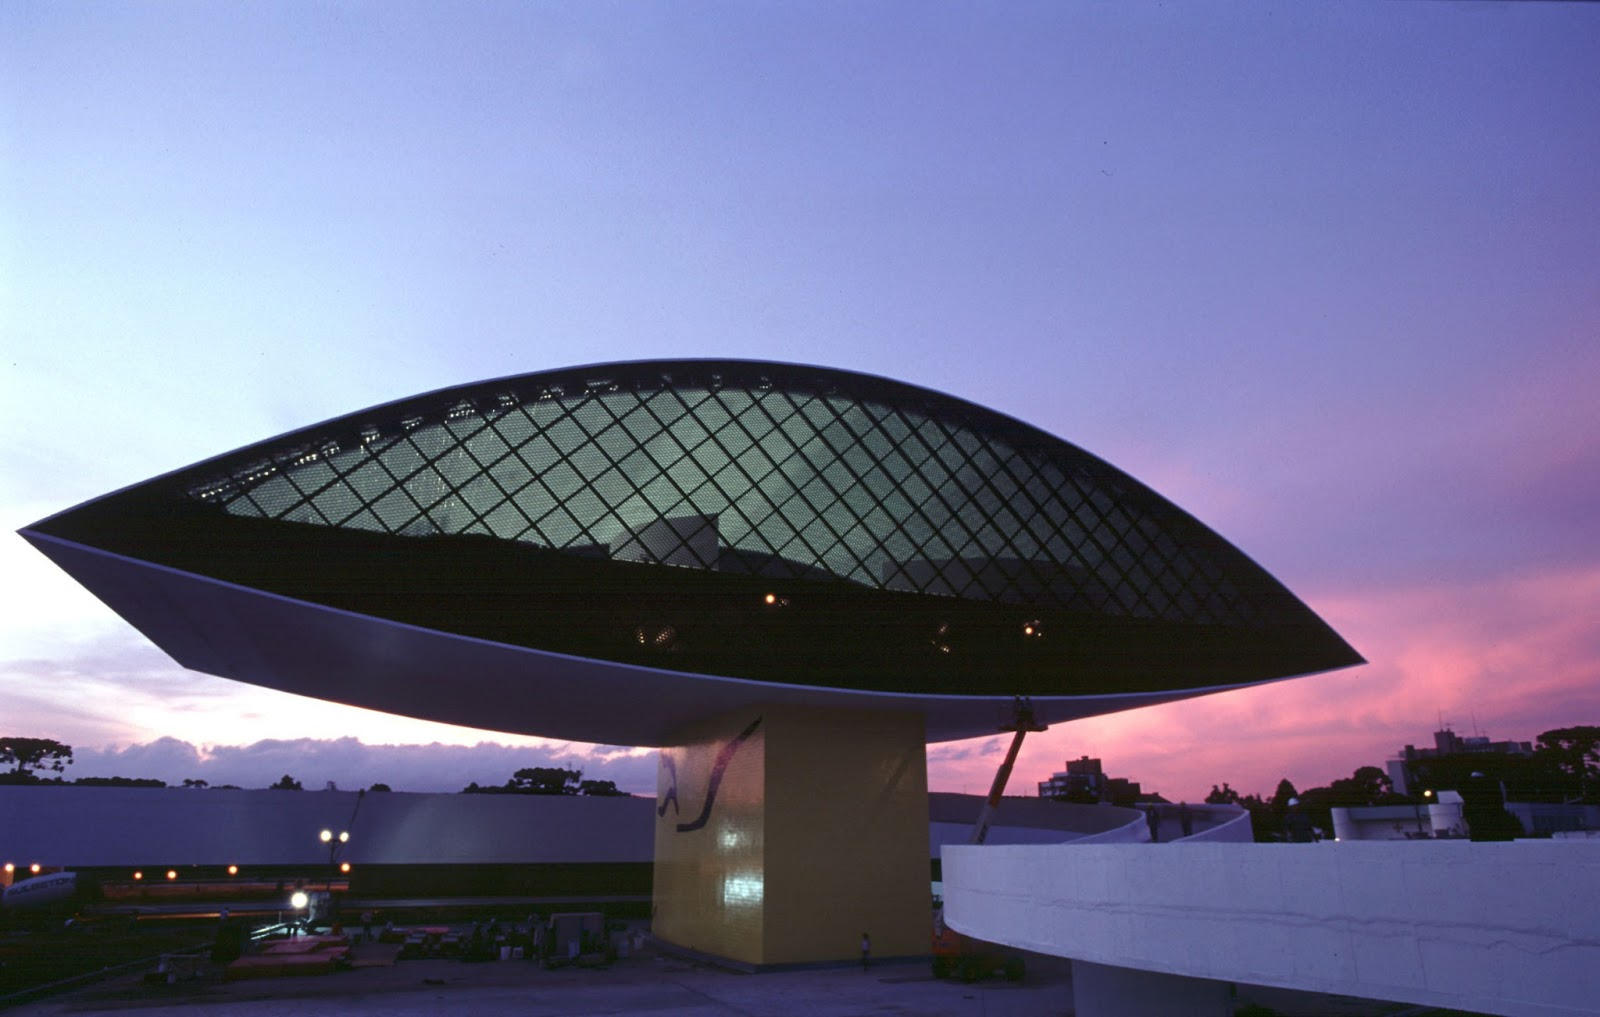 Museum Museu Oscar Niemeyer Curitiba Brazil Les Bons